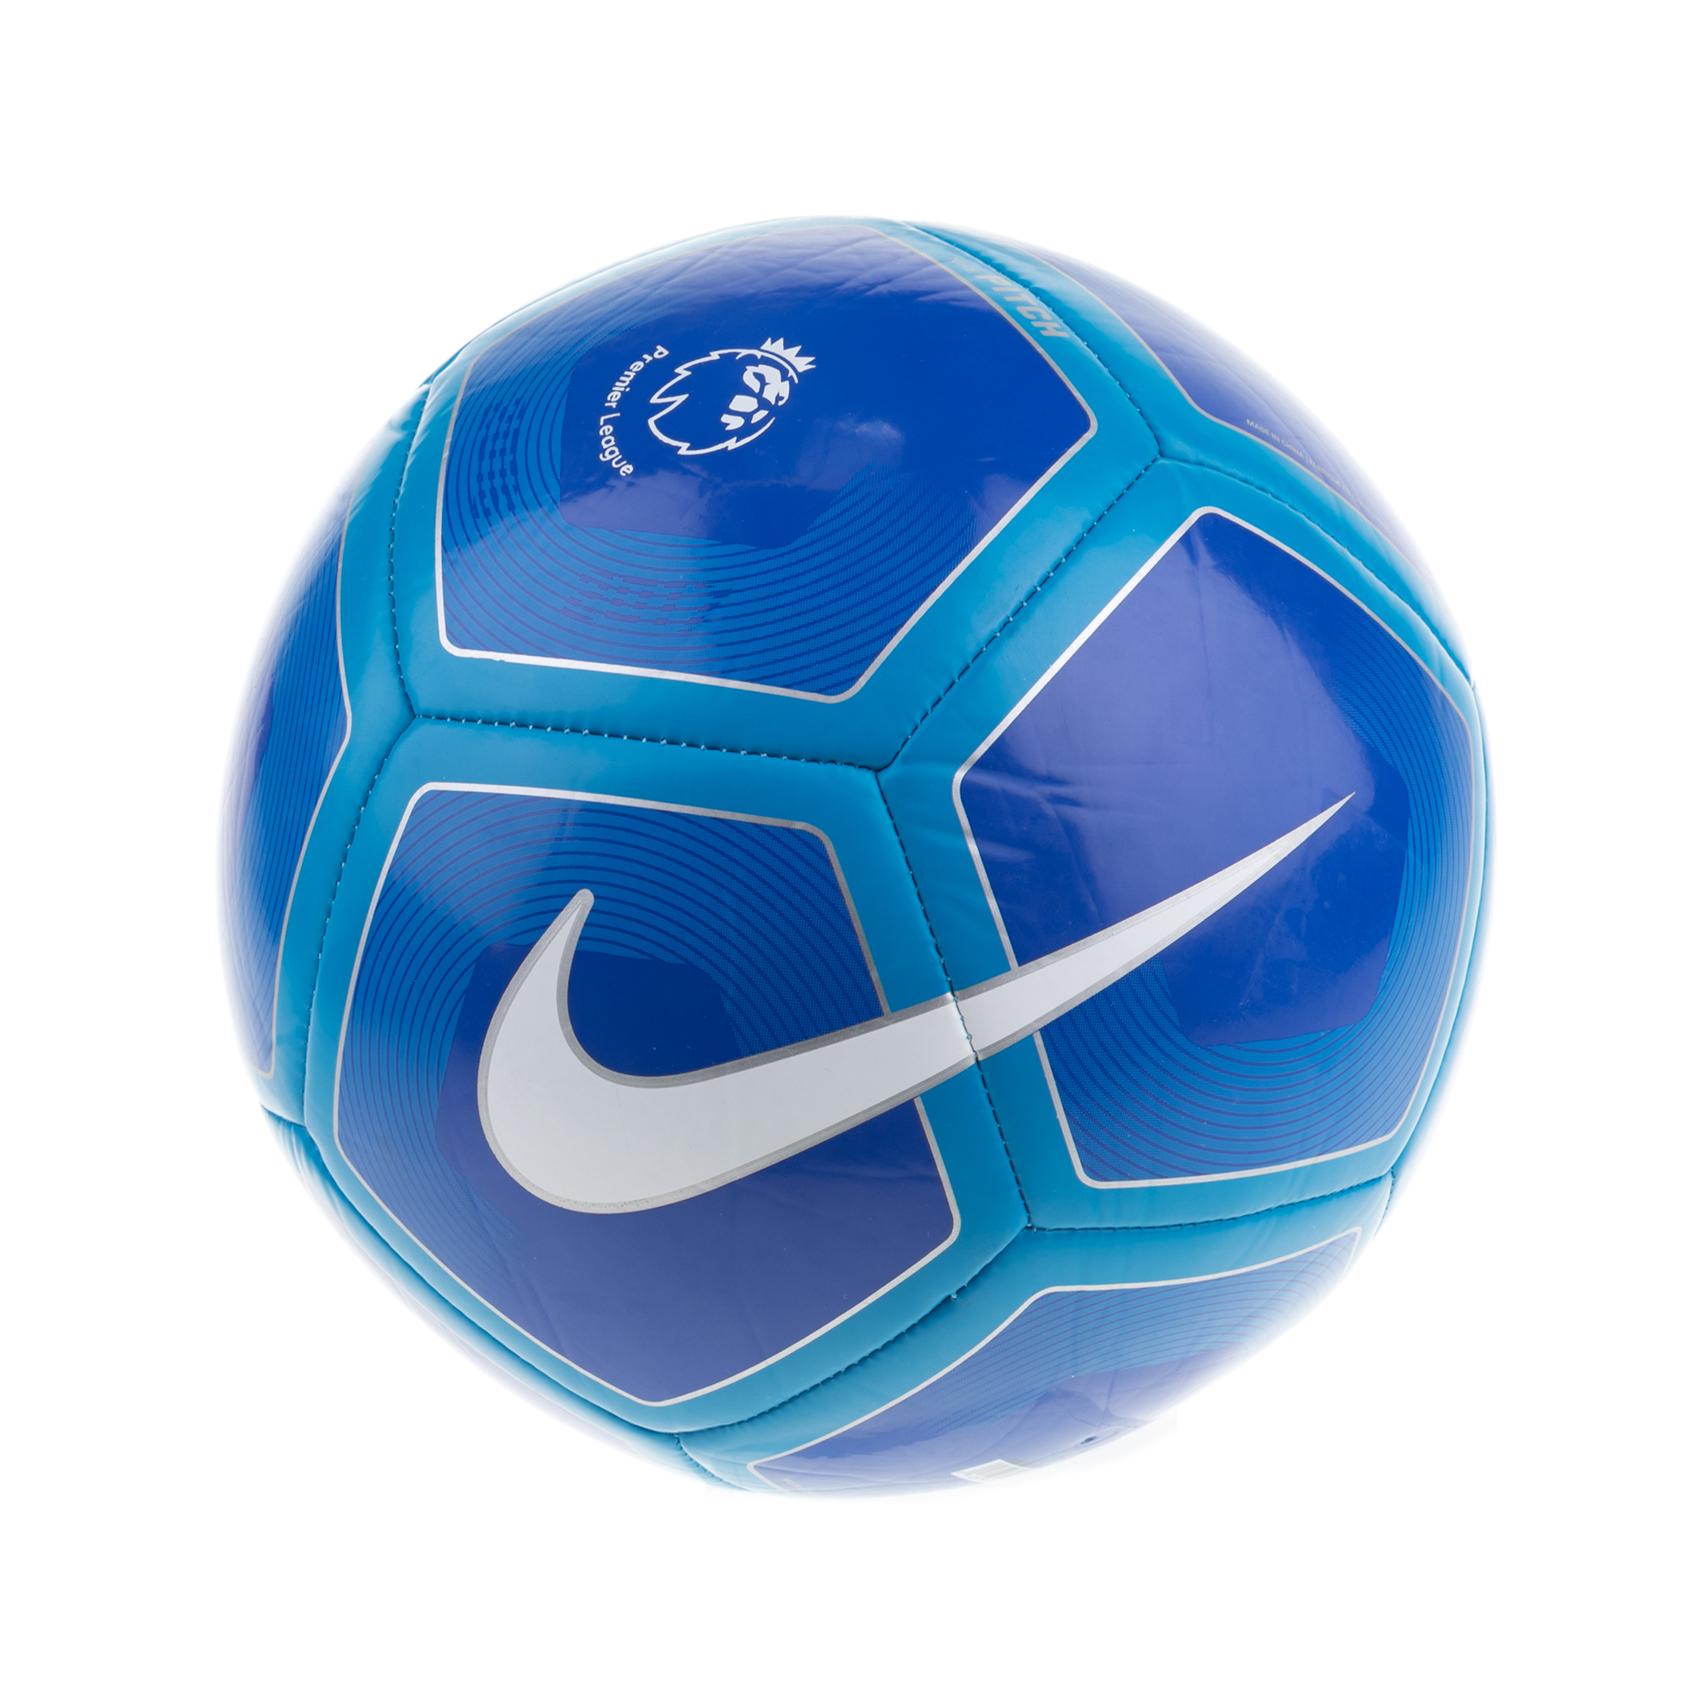 NIKE – Μπάλα ποδοσφαίρου Nike Premier League Pitch μπλε